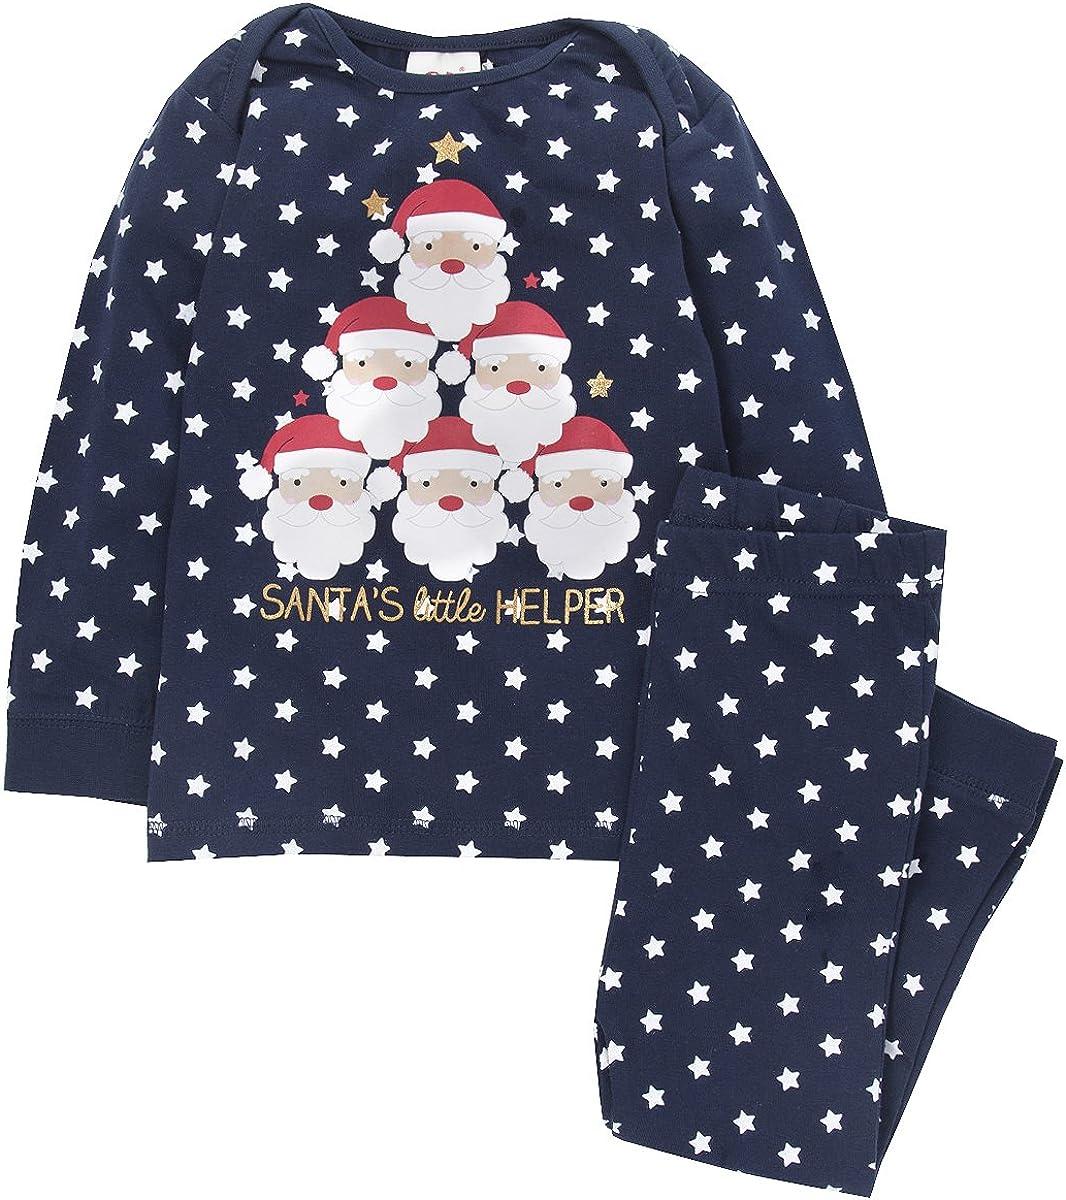 Unisex Baby Toddler 100/% Cotton Novelty Christmas Pyjama PJ Set Sizes 6-24 Months QT